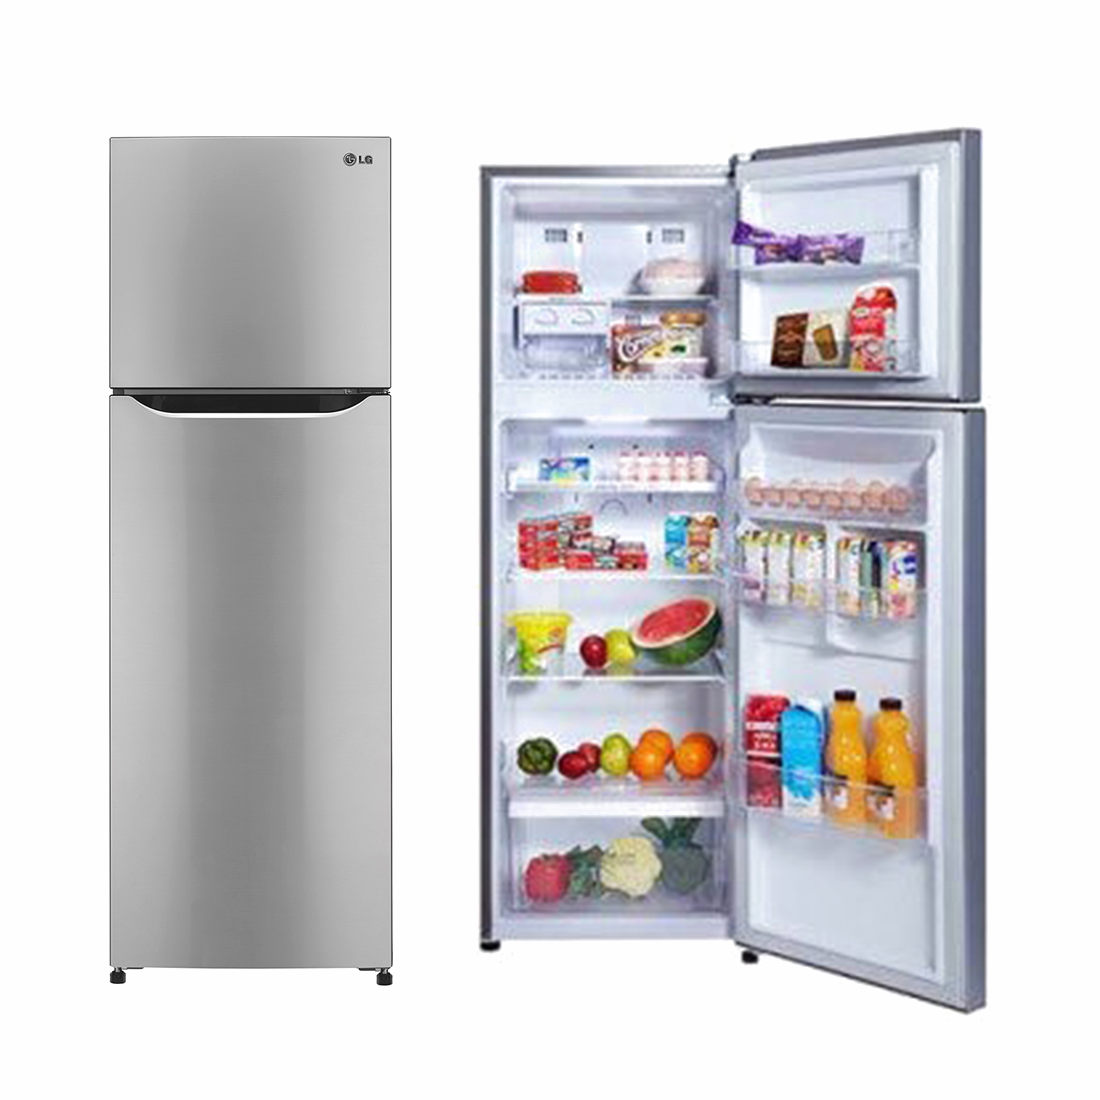 LG Refrigerator PNG Free Download.